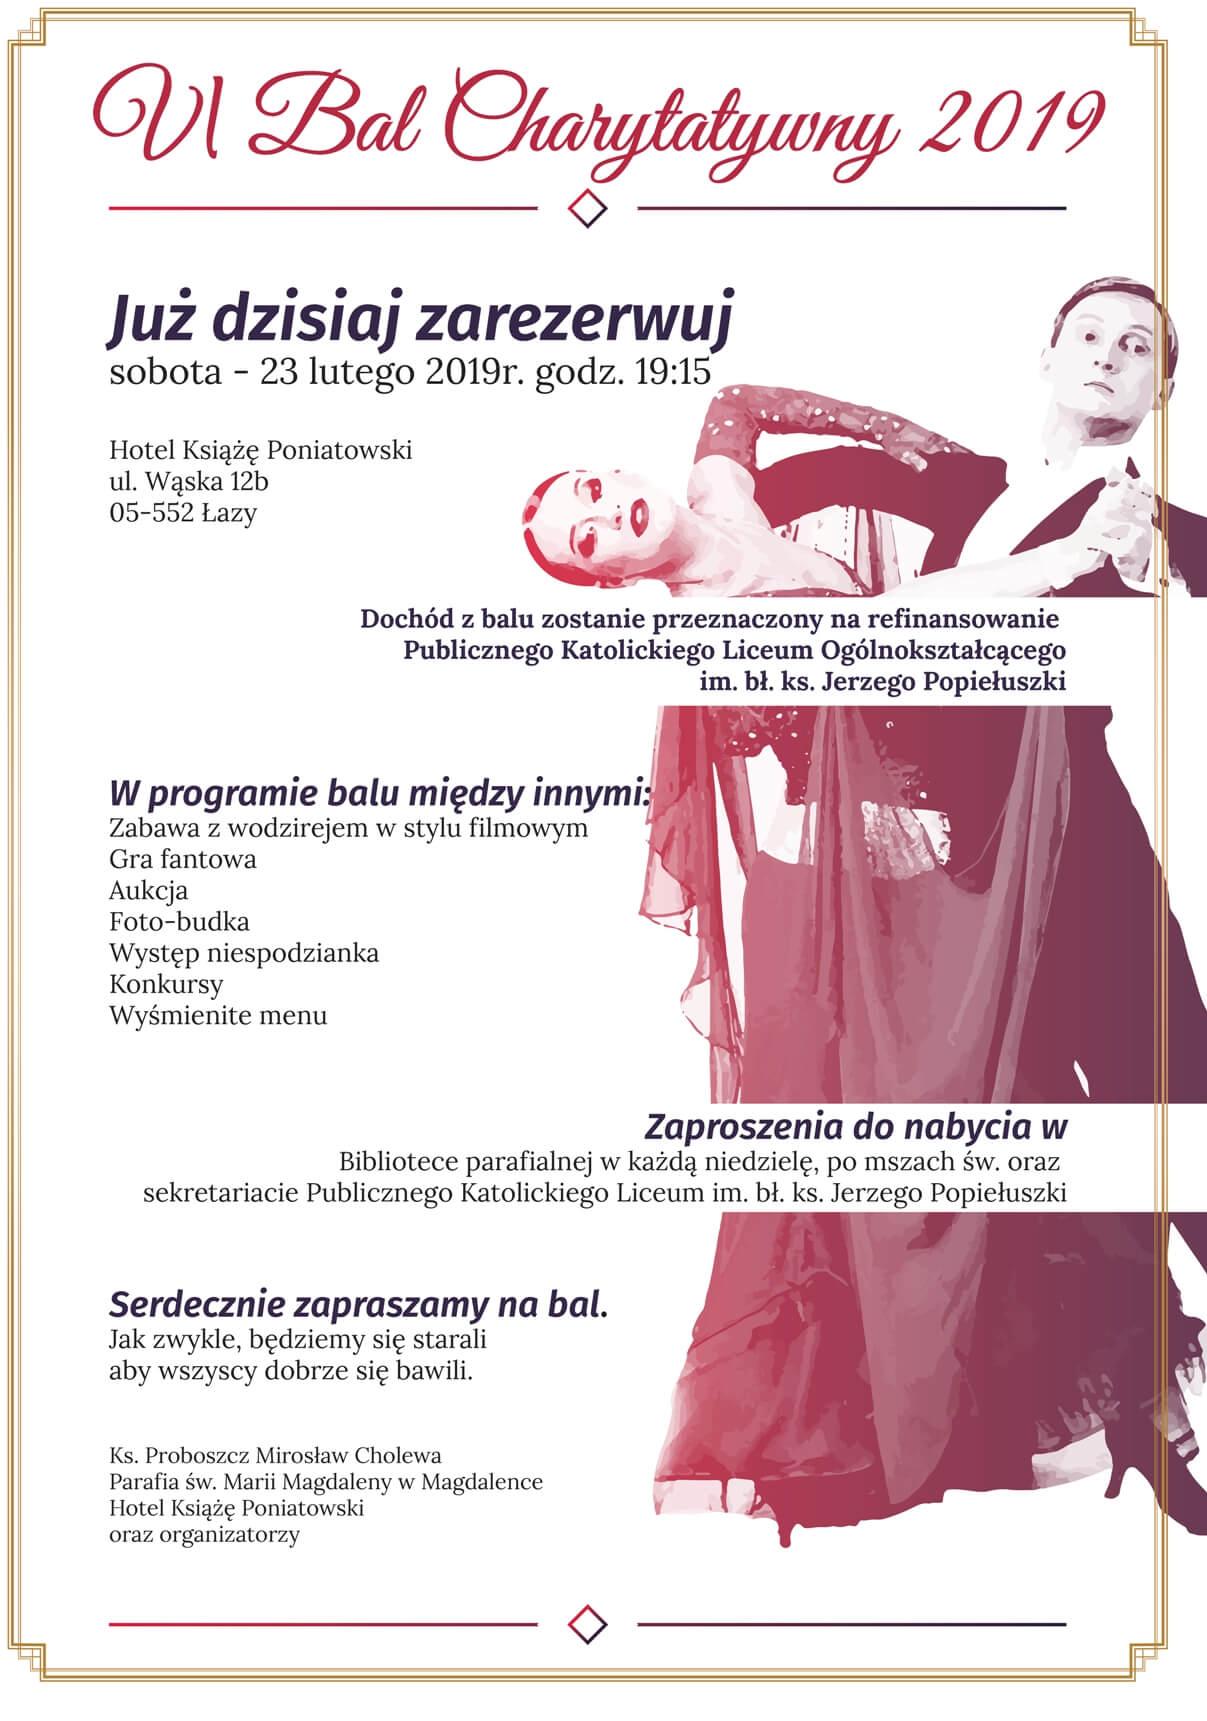 Vi Bal Charytatywny Parafia Magdalenka